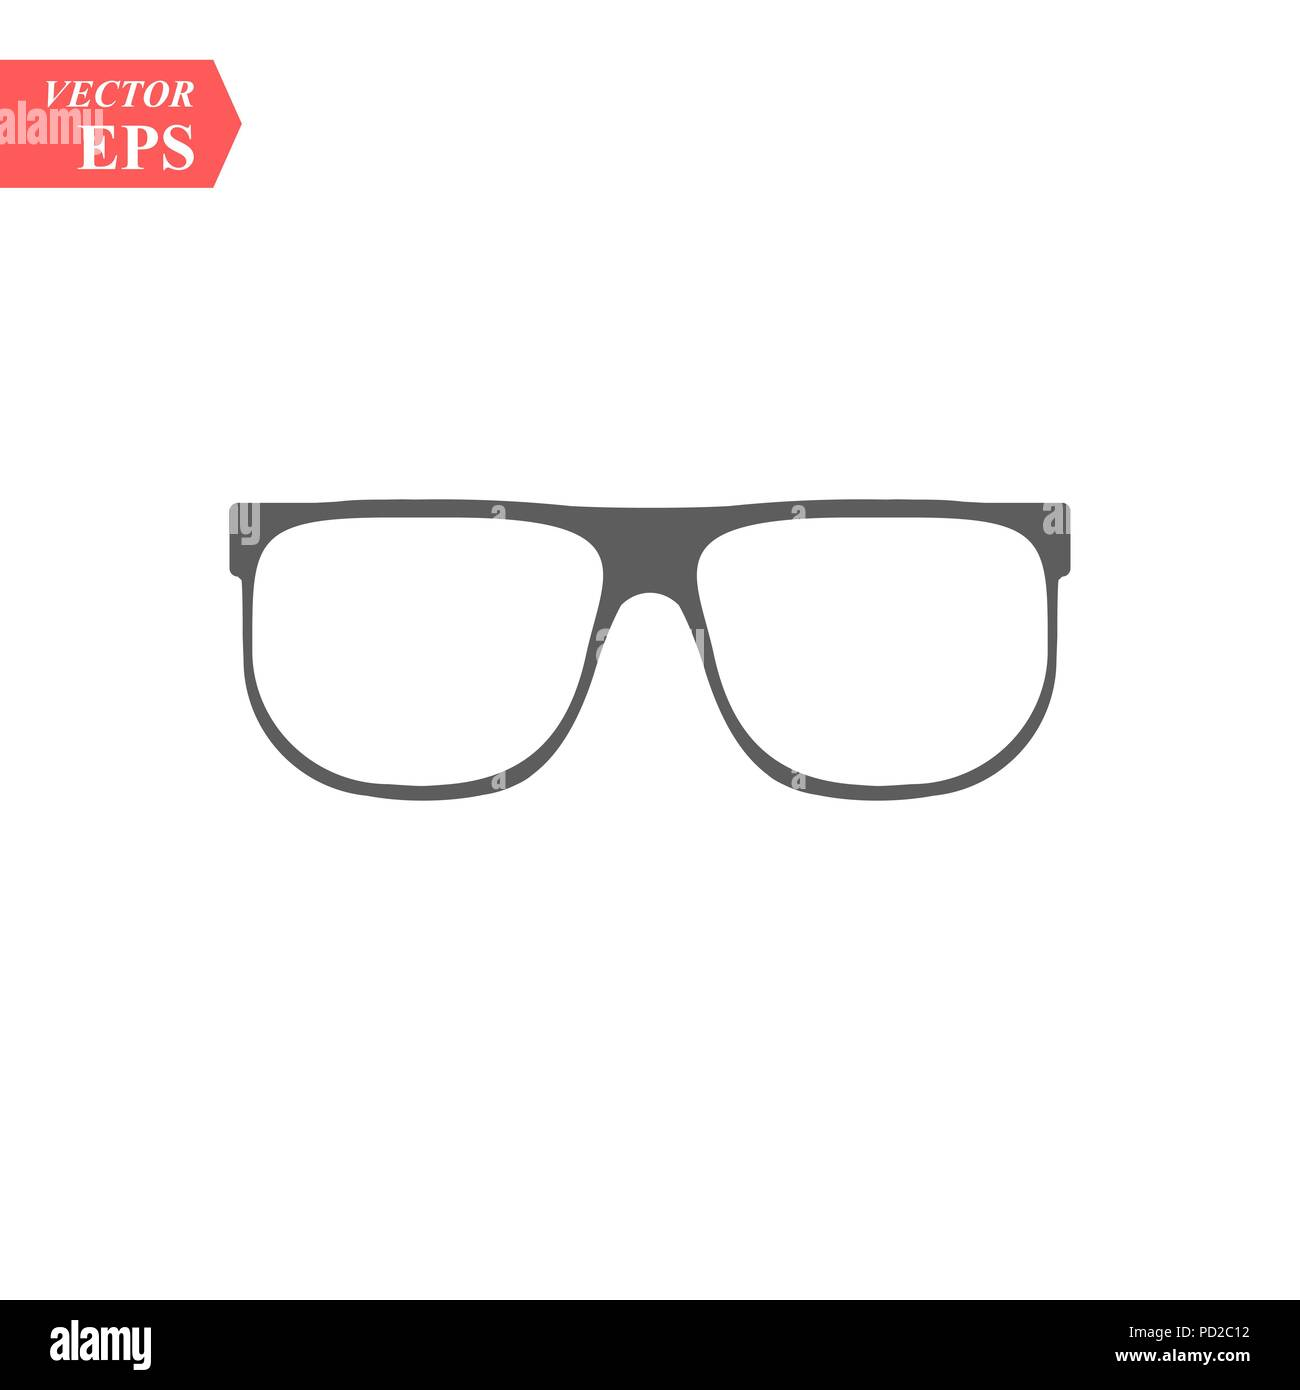 e6801ce0d6c classic glasses icon. Eyeglass frame element icon. Premium quality graphic  design icon. Baby Signs